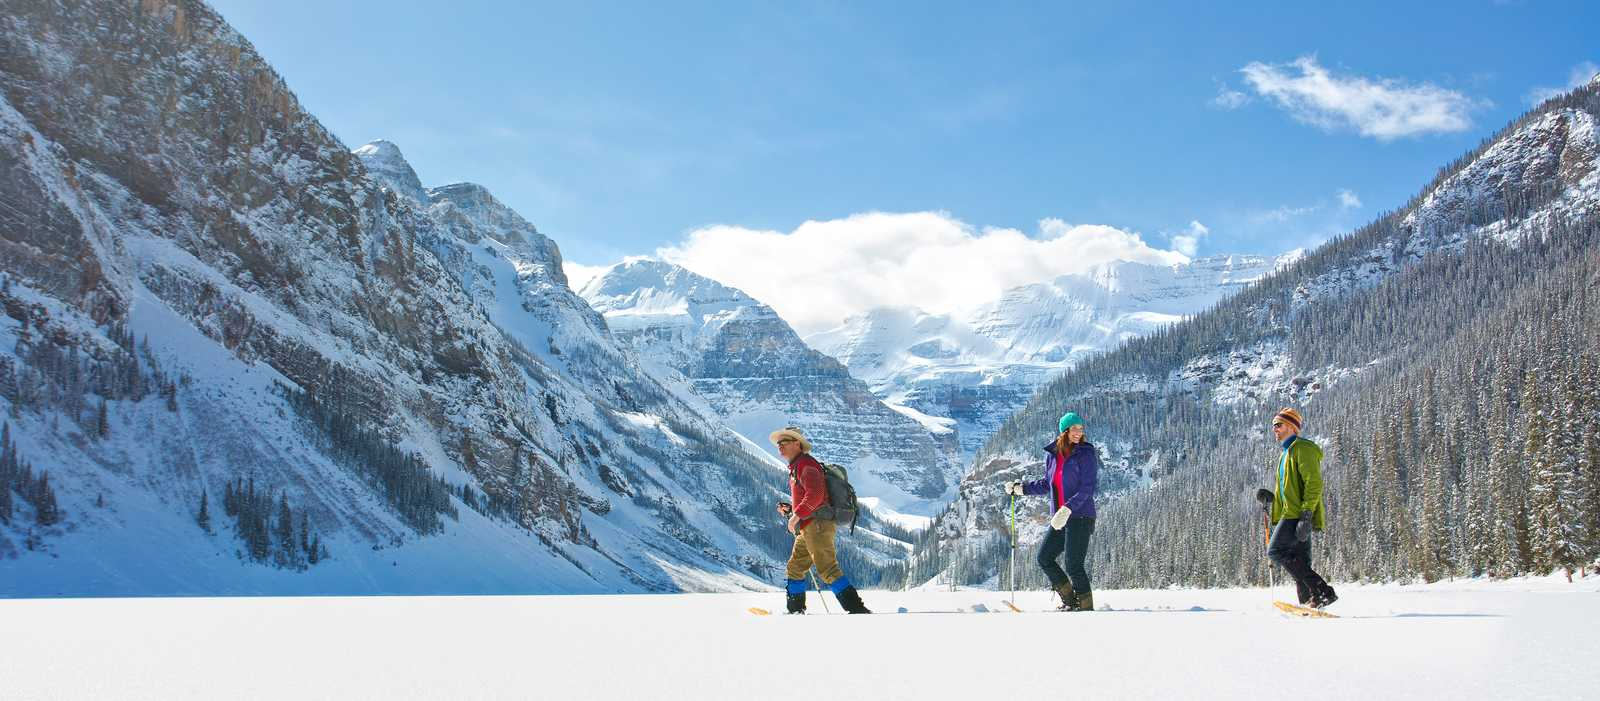 Schneeschuhwanderung am Fairmont Chateau Lake Louise, Alberta